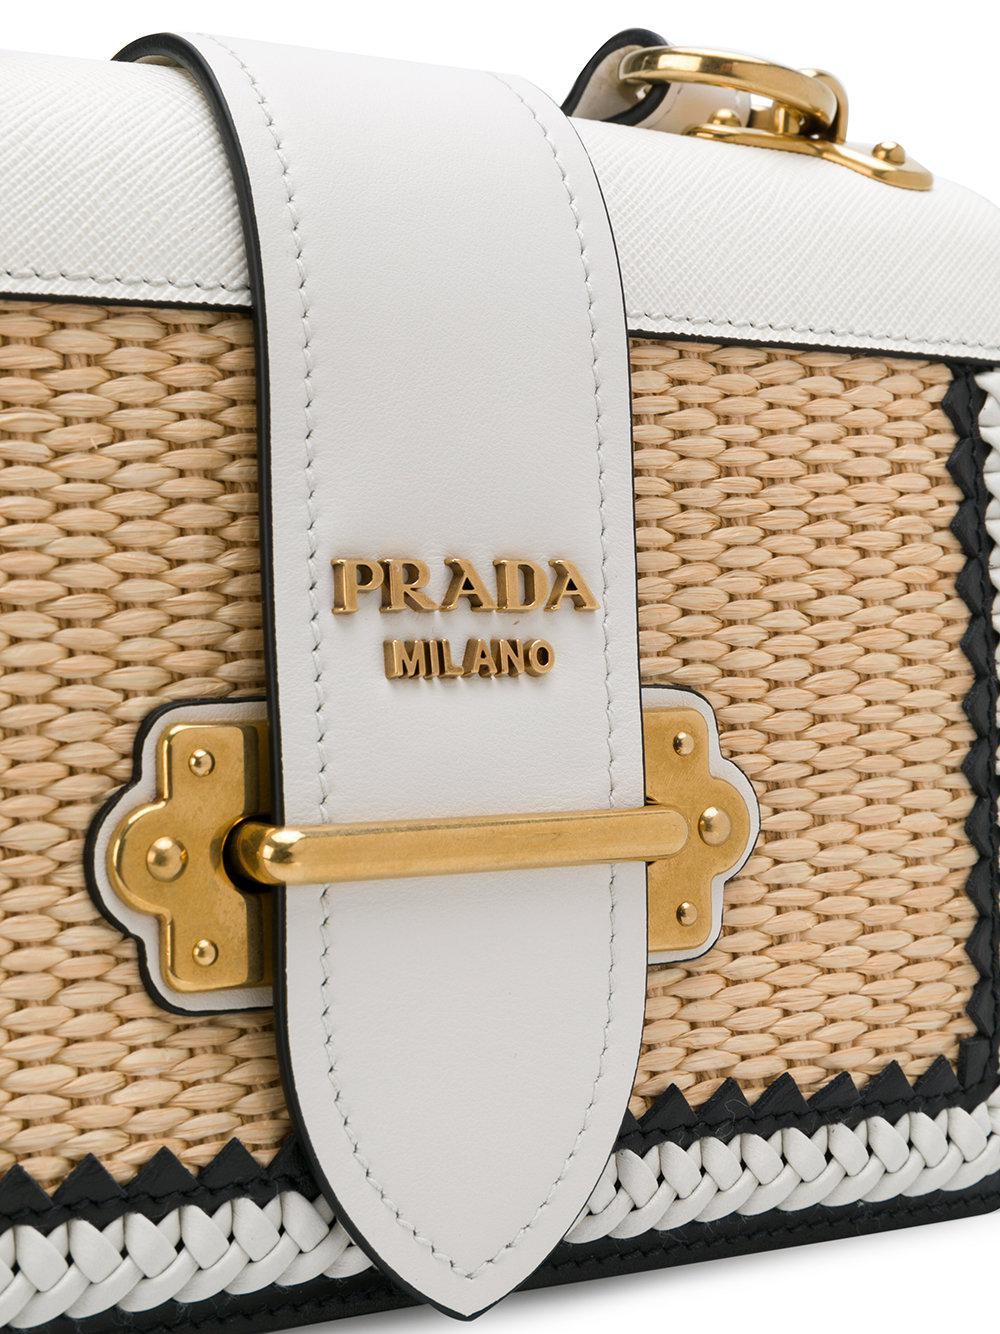 Lyst - Prada White Raffia Cahier Shoulder Bag in White 744cf7b2a4b0e